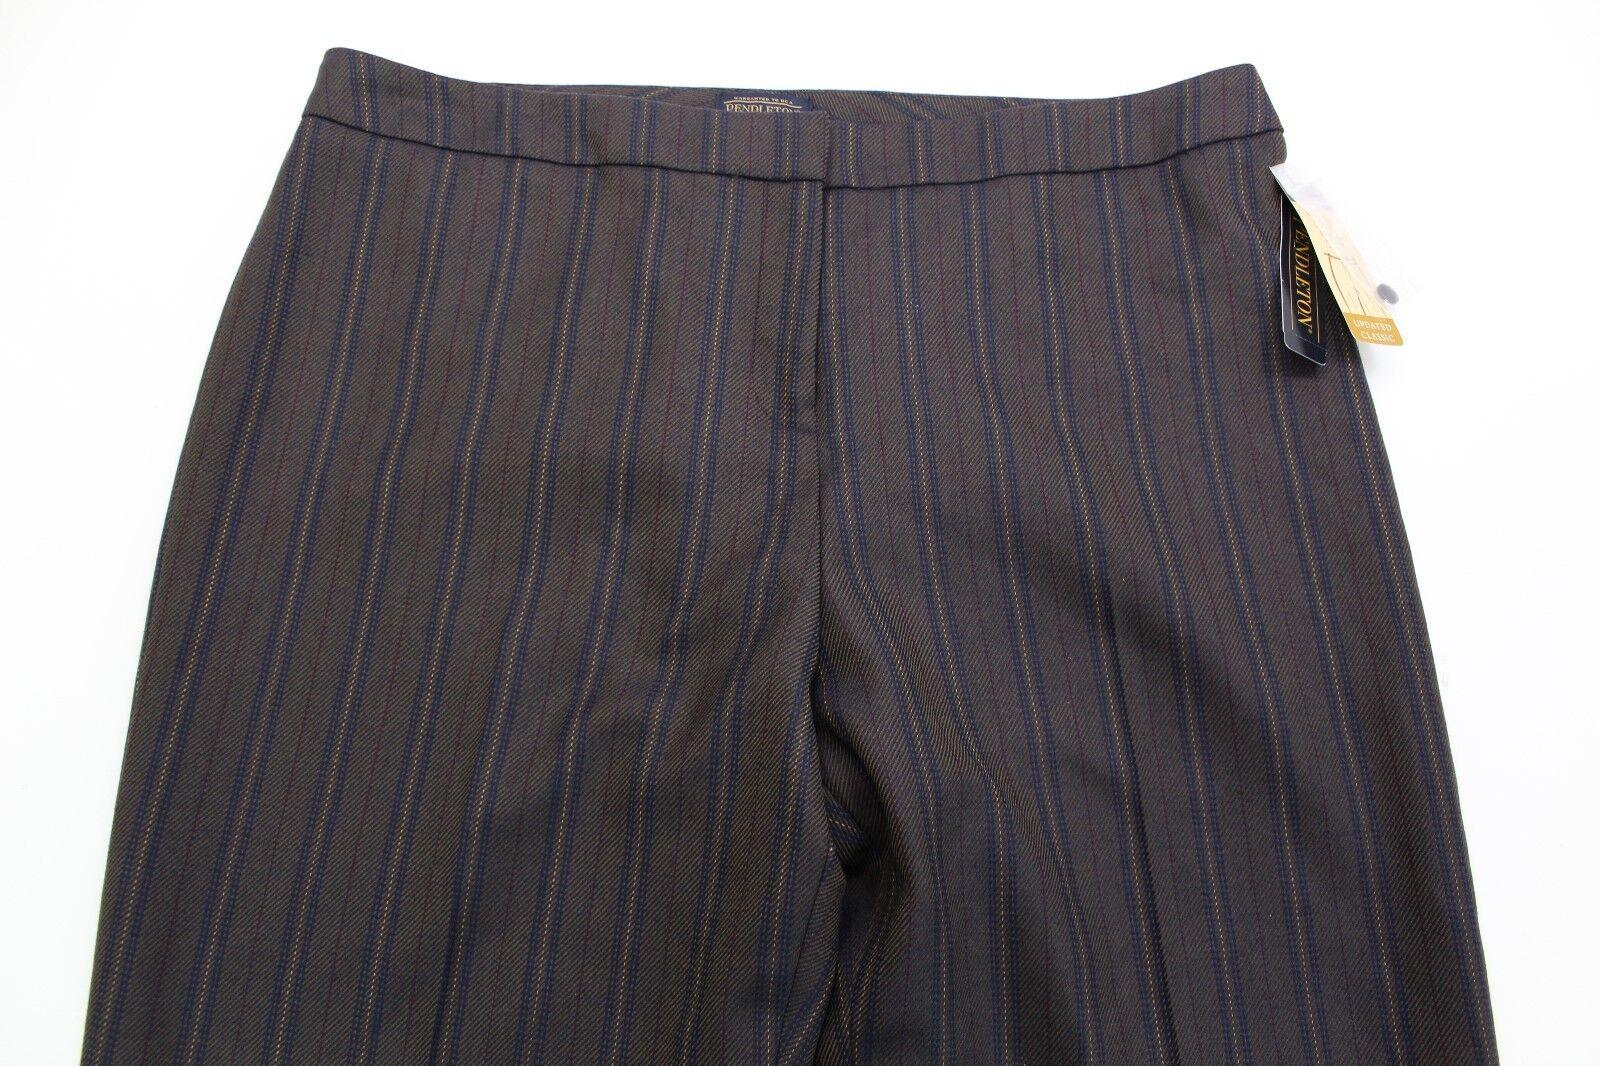 Pendleton women's 100% WOOL LINED pants 18 MSRP  179